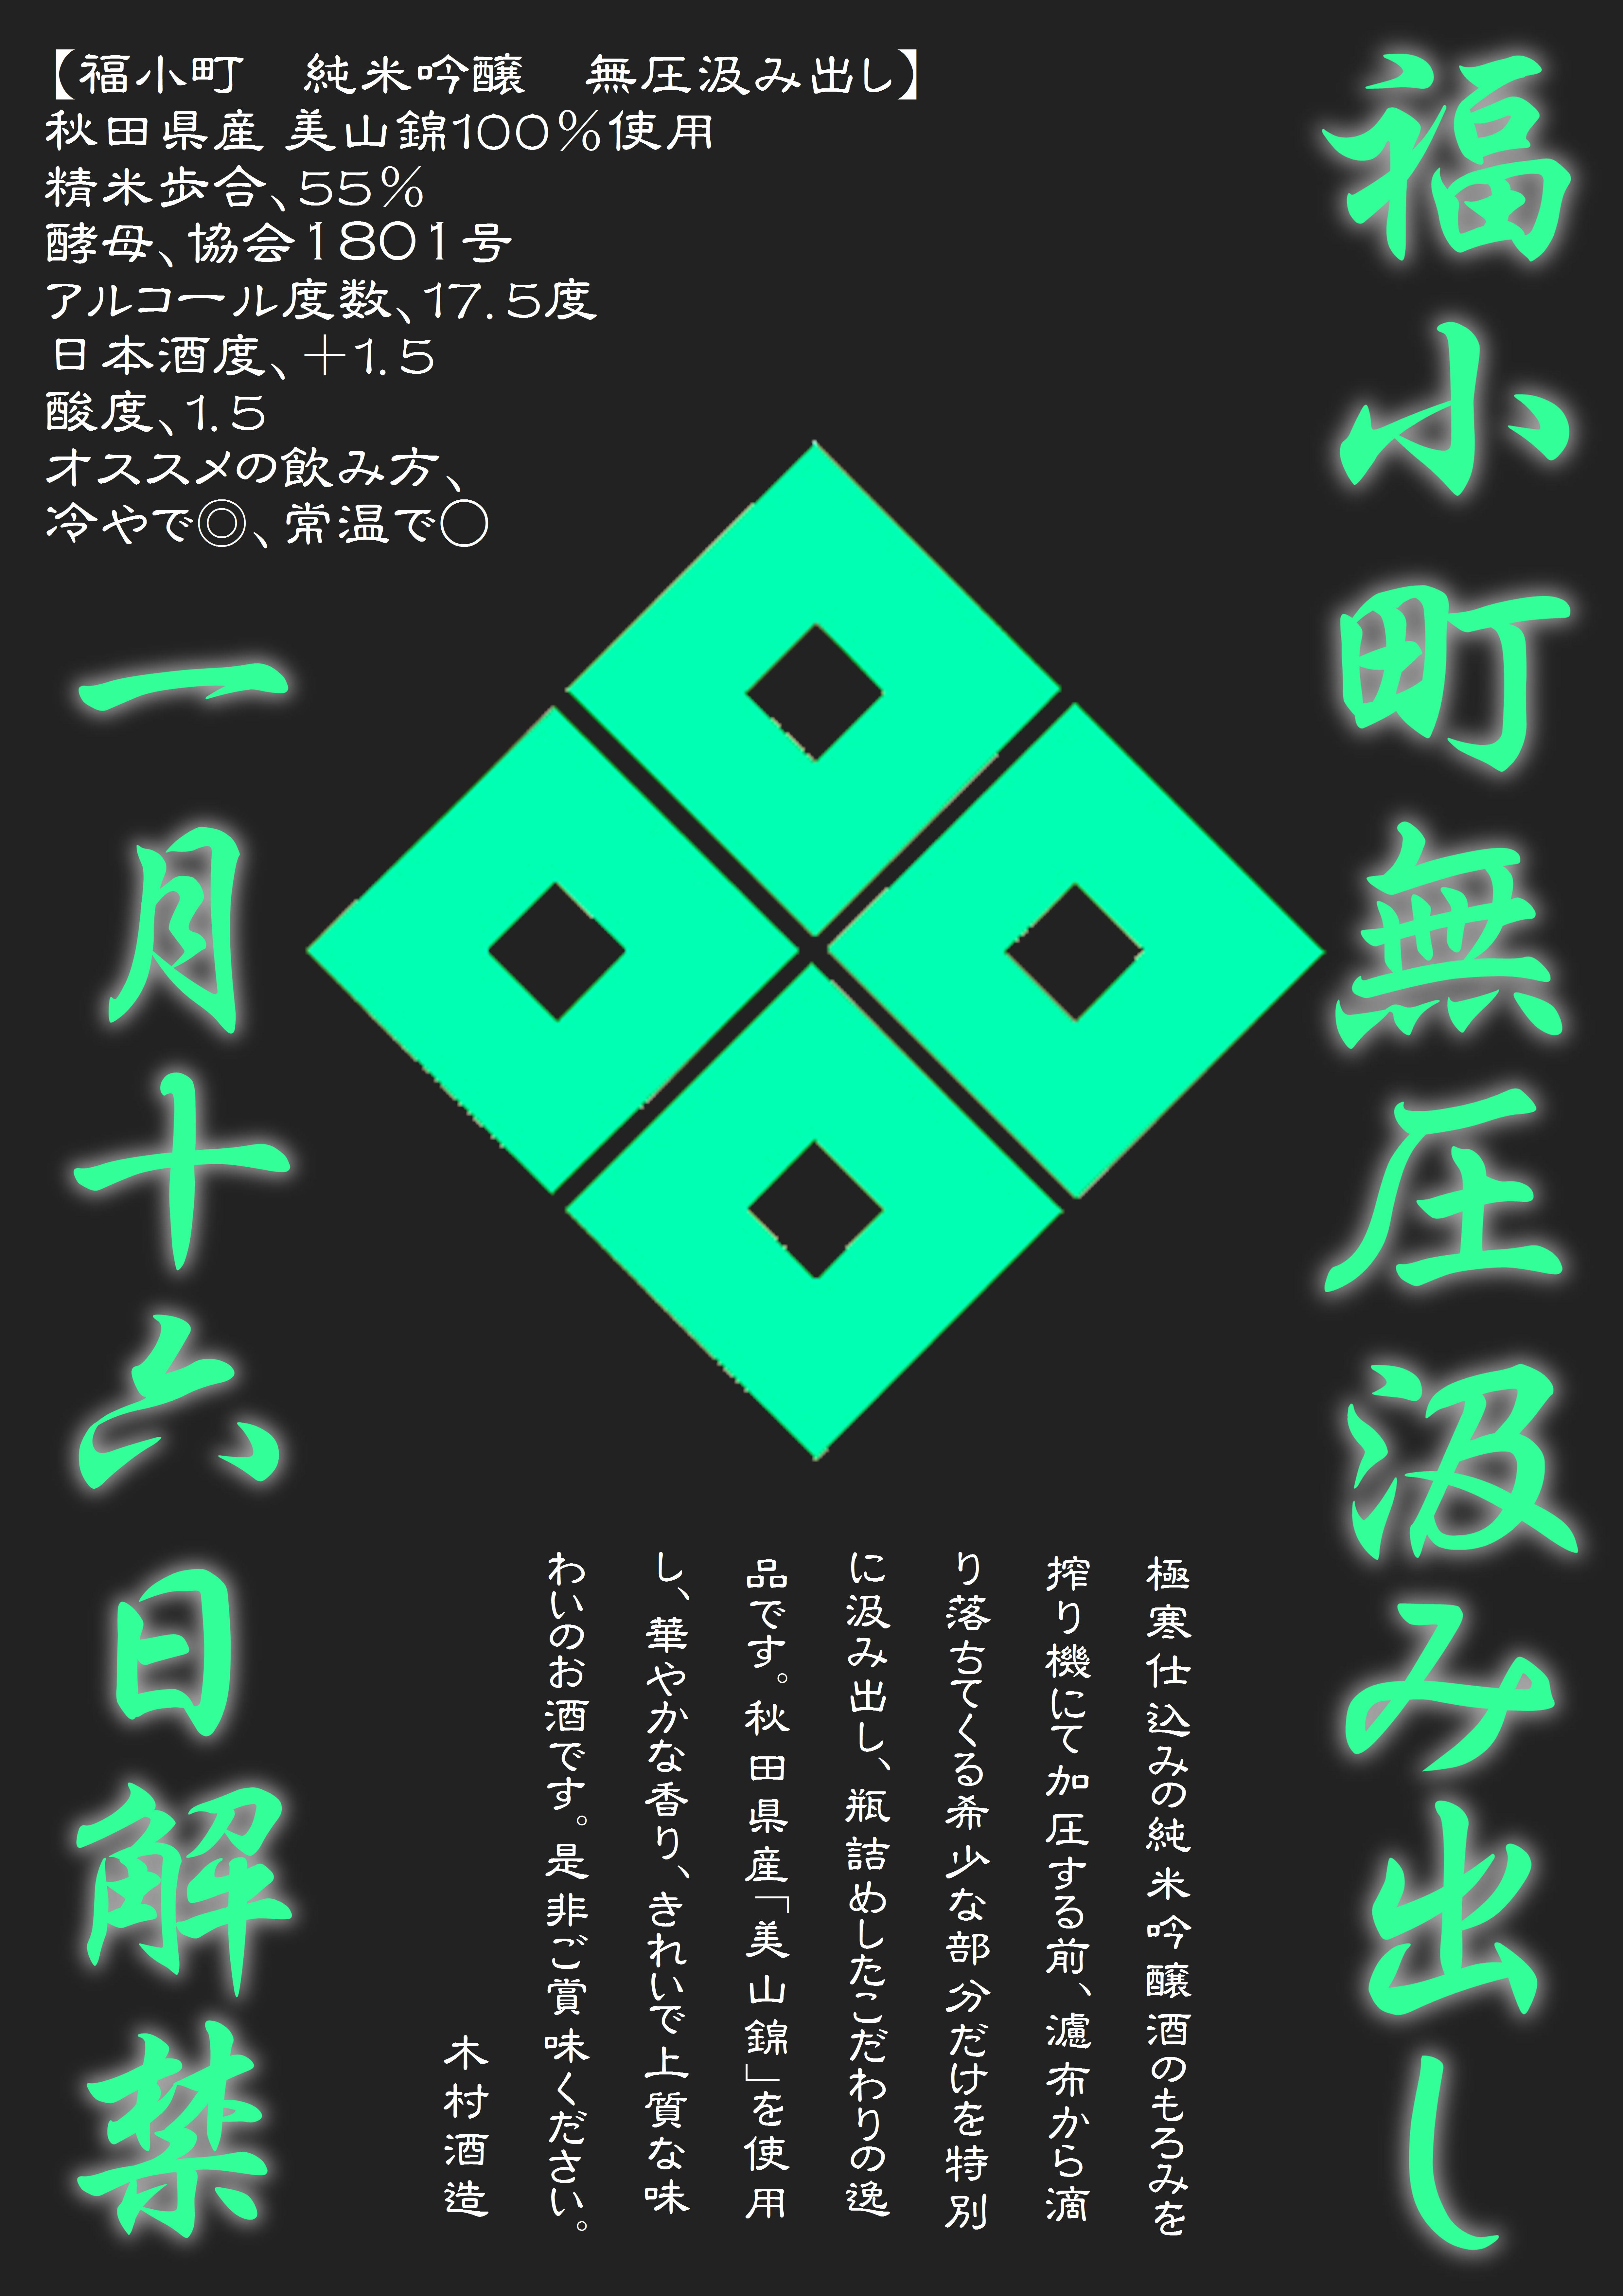 http://www.fukukomachi.com/blog/photo/20180112.JPG